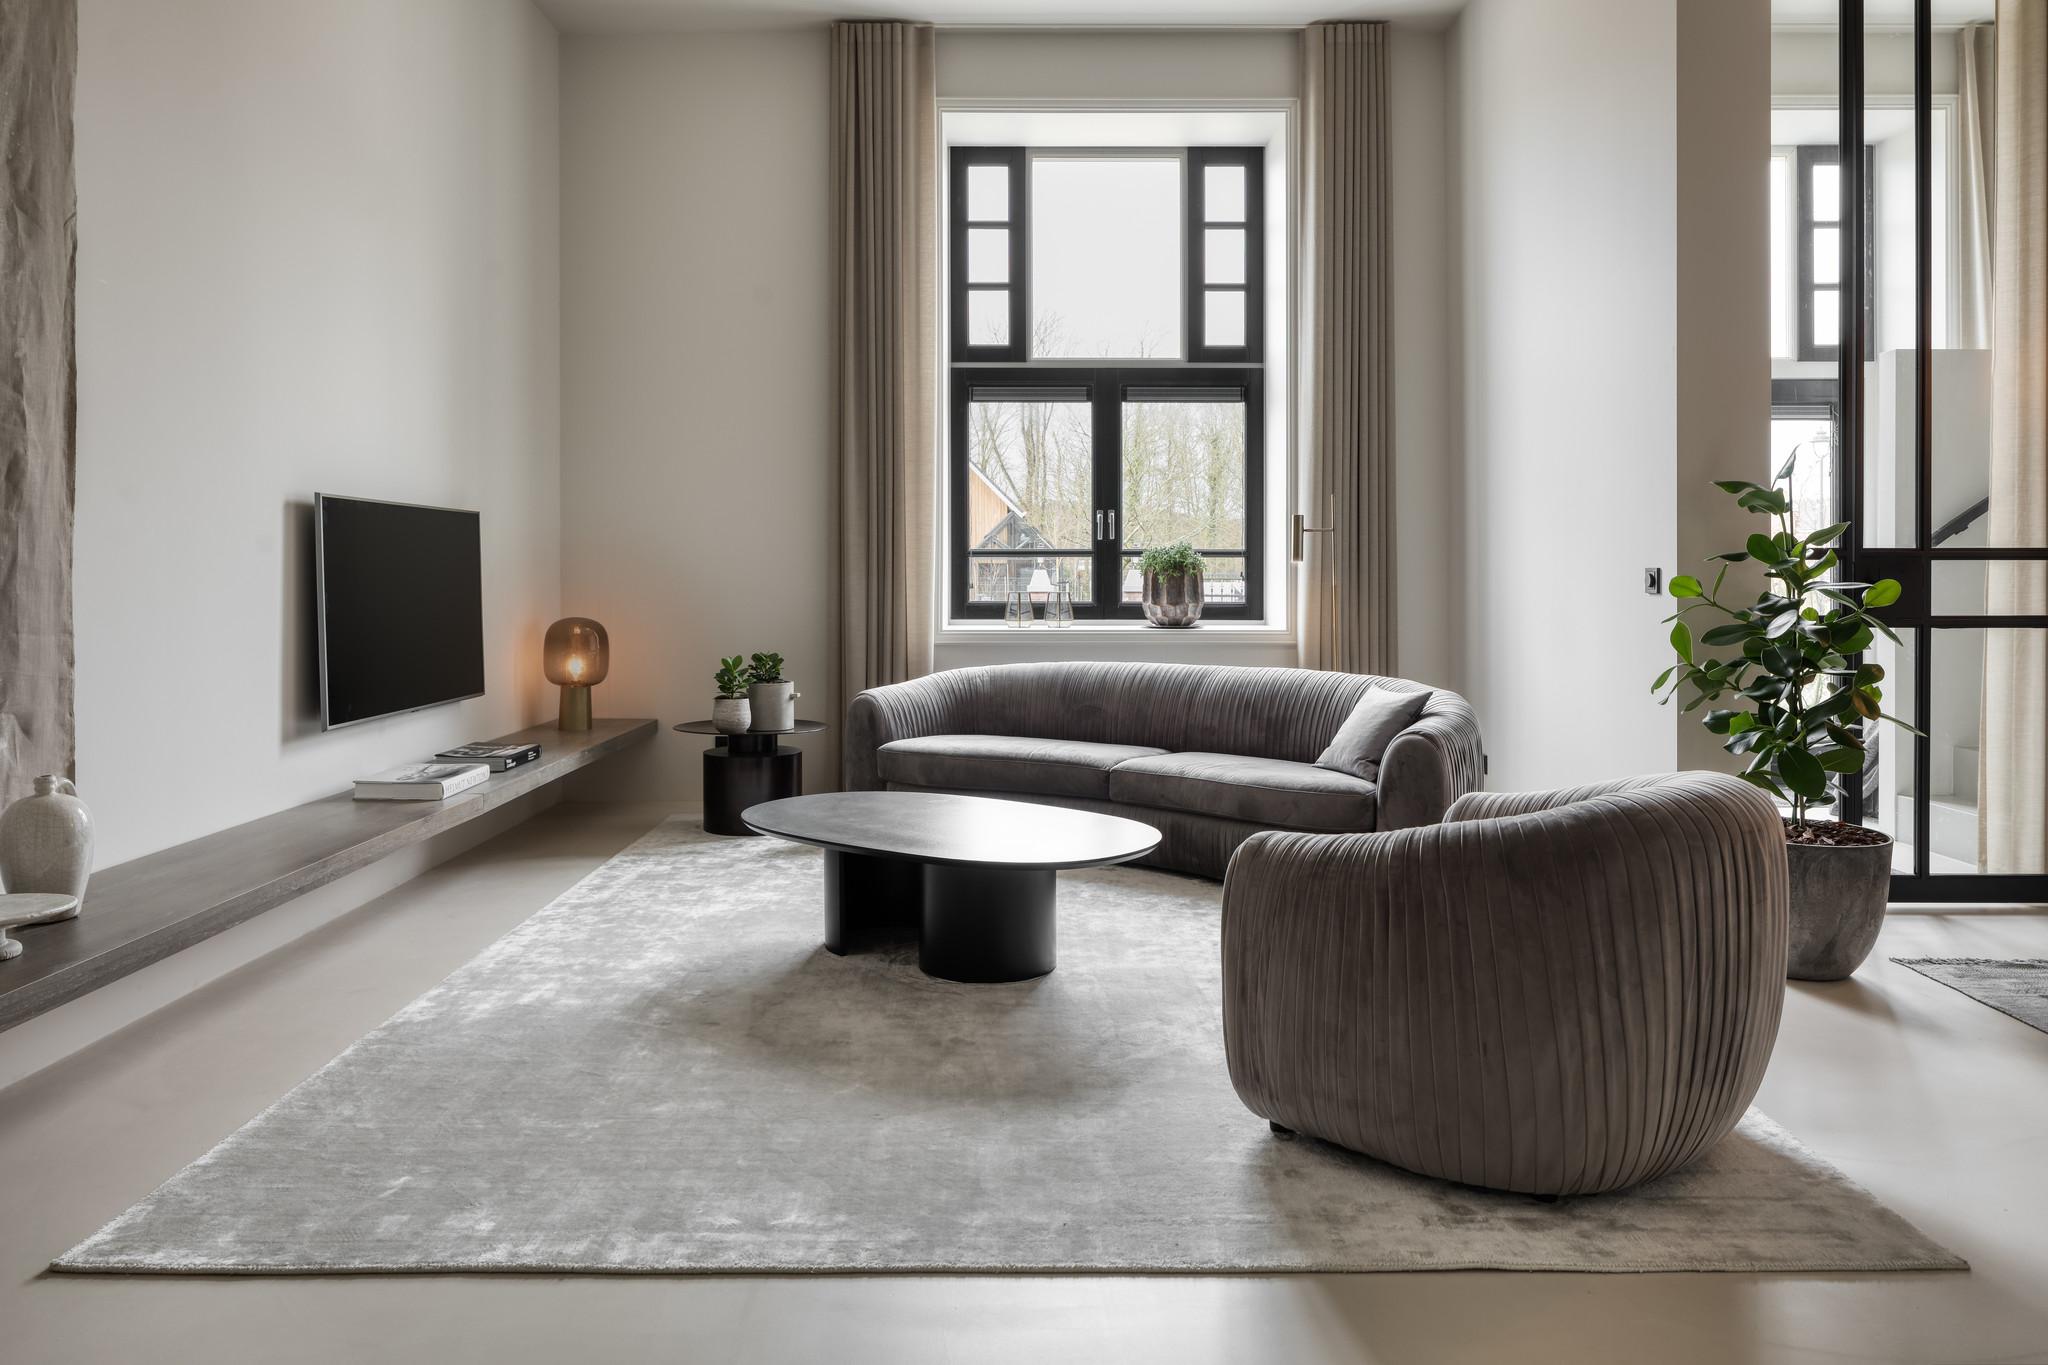 CHIANTI Carpet Silver Beige 300x400-2